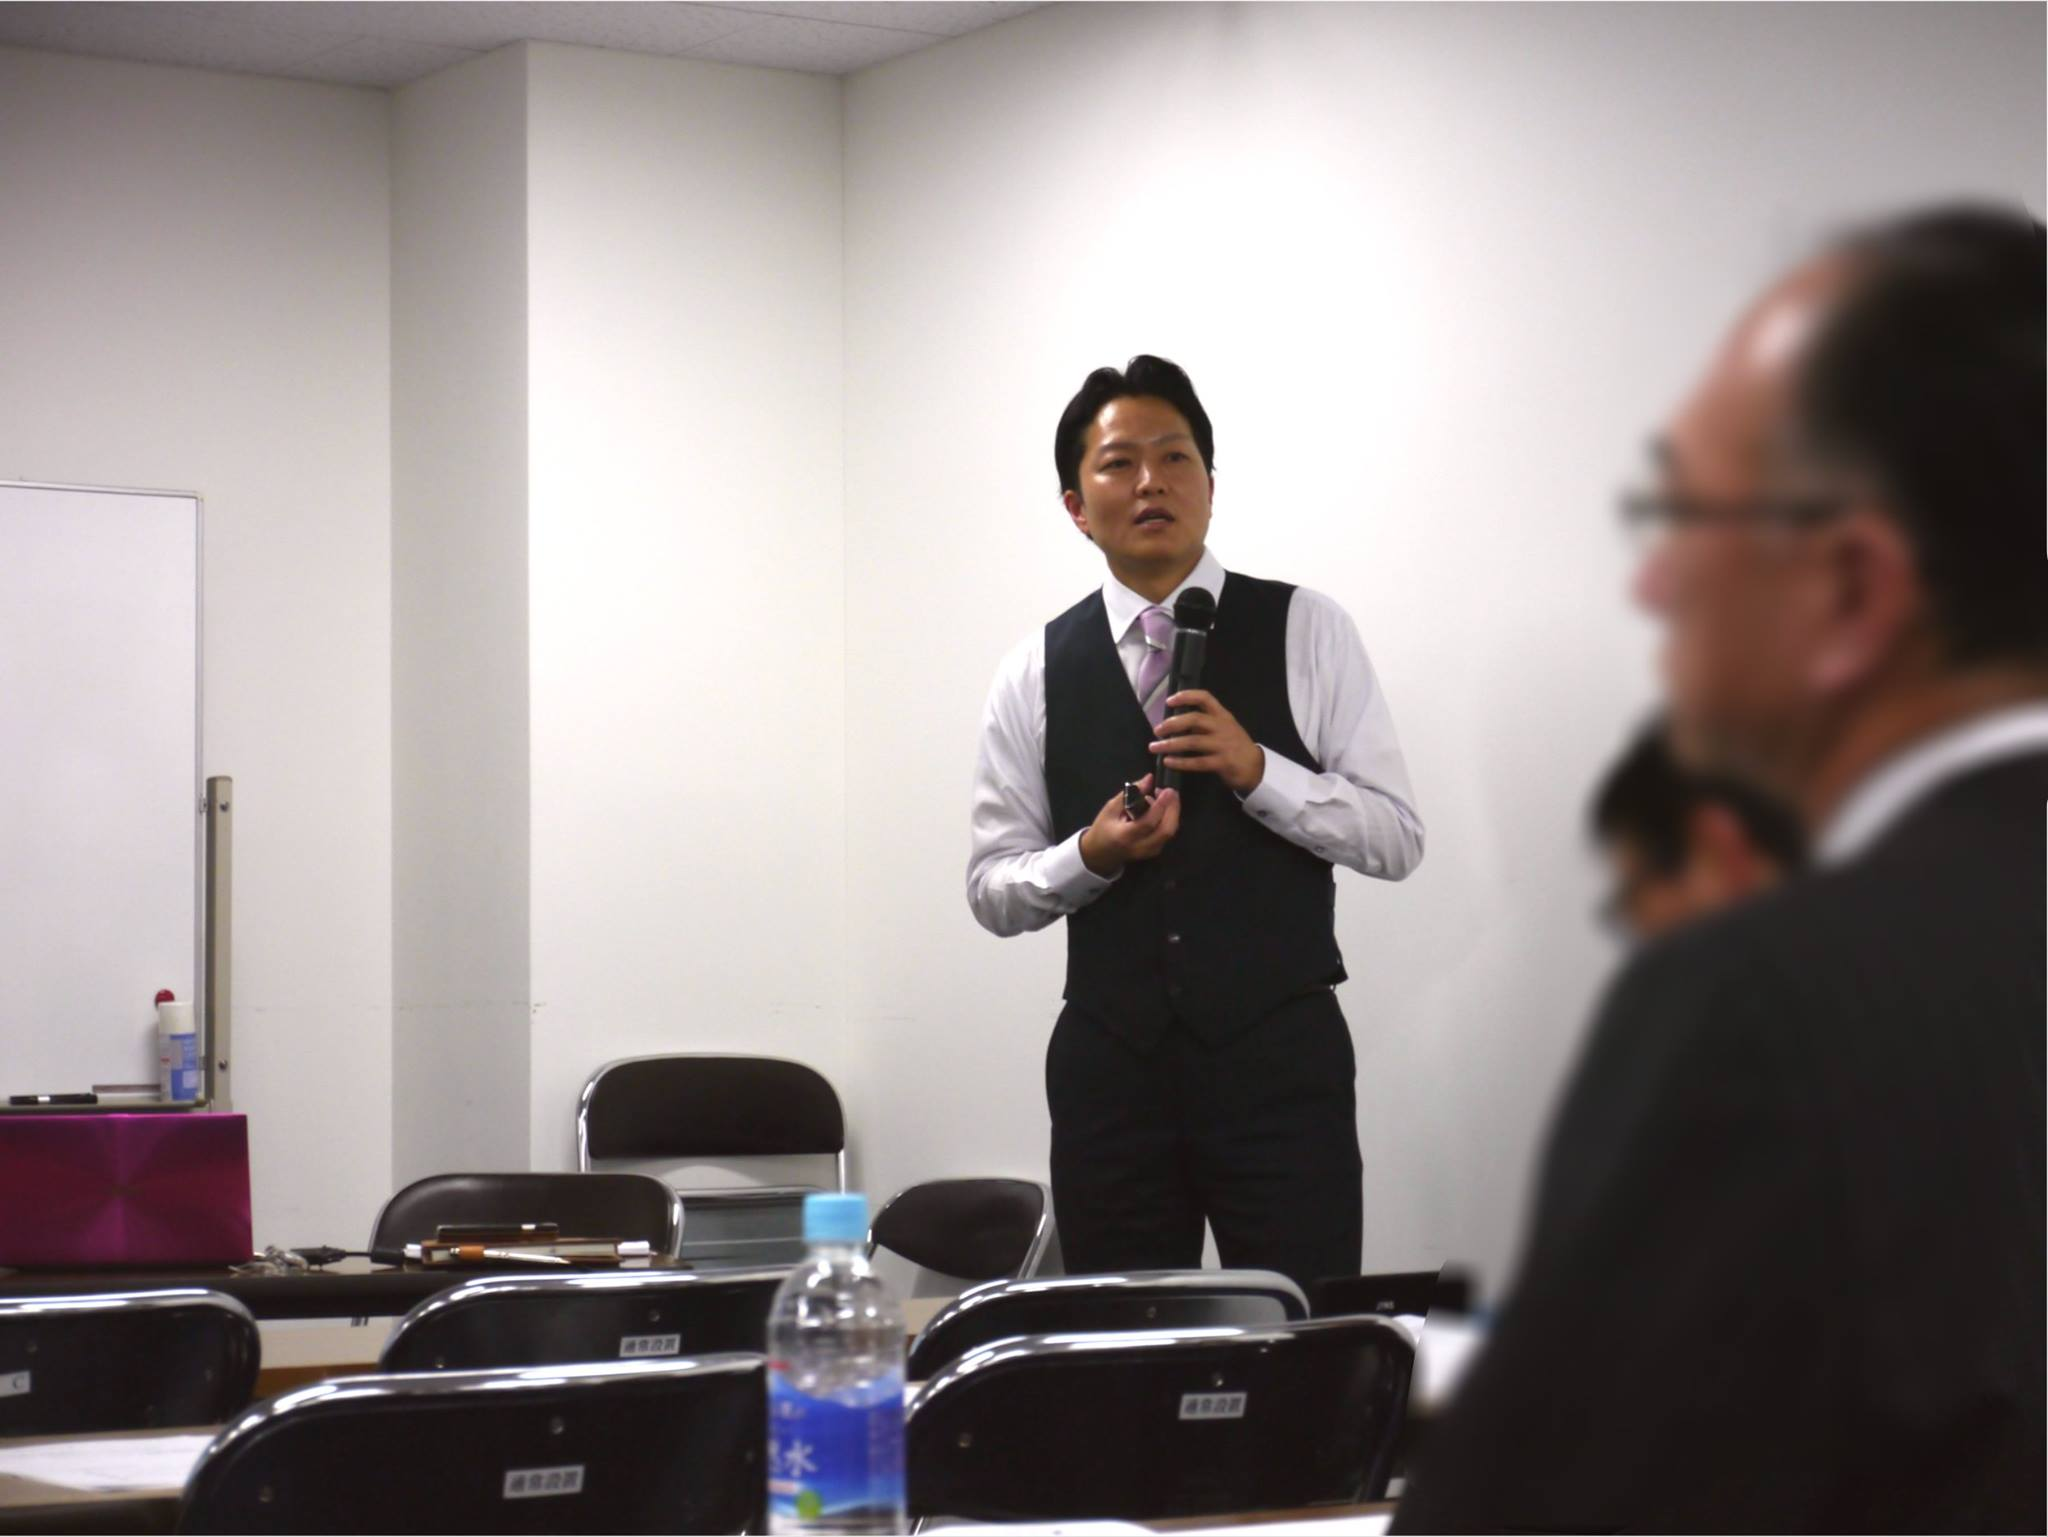 不採択になる小規模事業者持続化補助金申請書の作り方セミナー開催!|行政書士阿部総合事務所